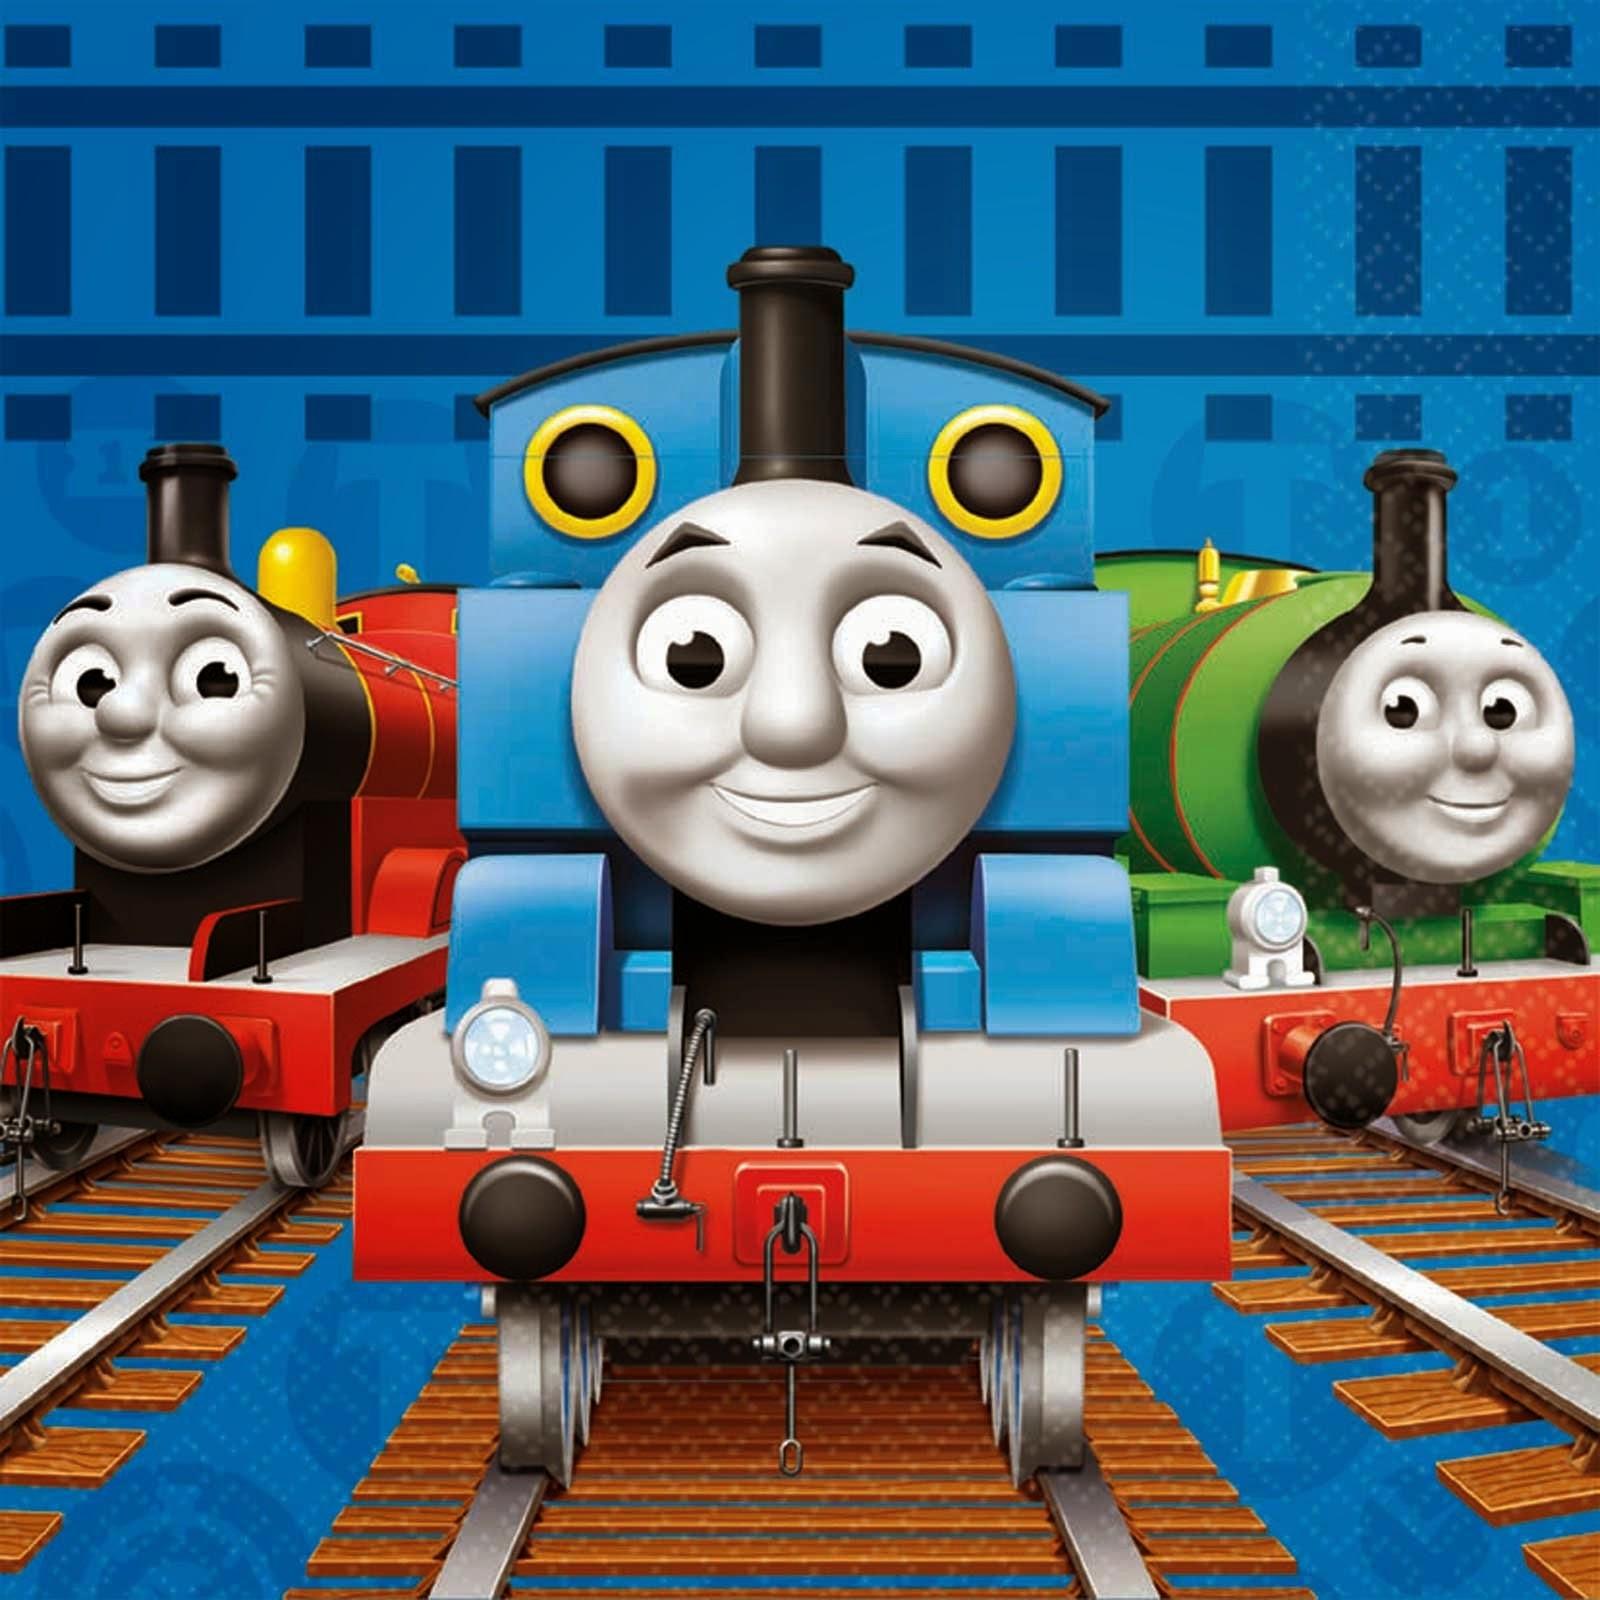 Kumpulan Gambar Thomas The Tank Engine & Friends